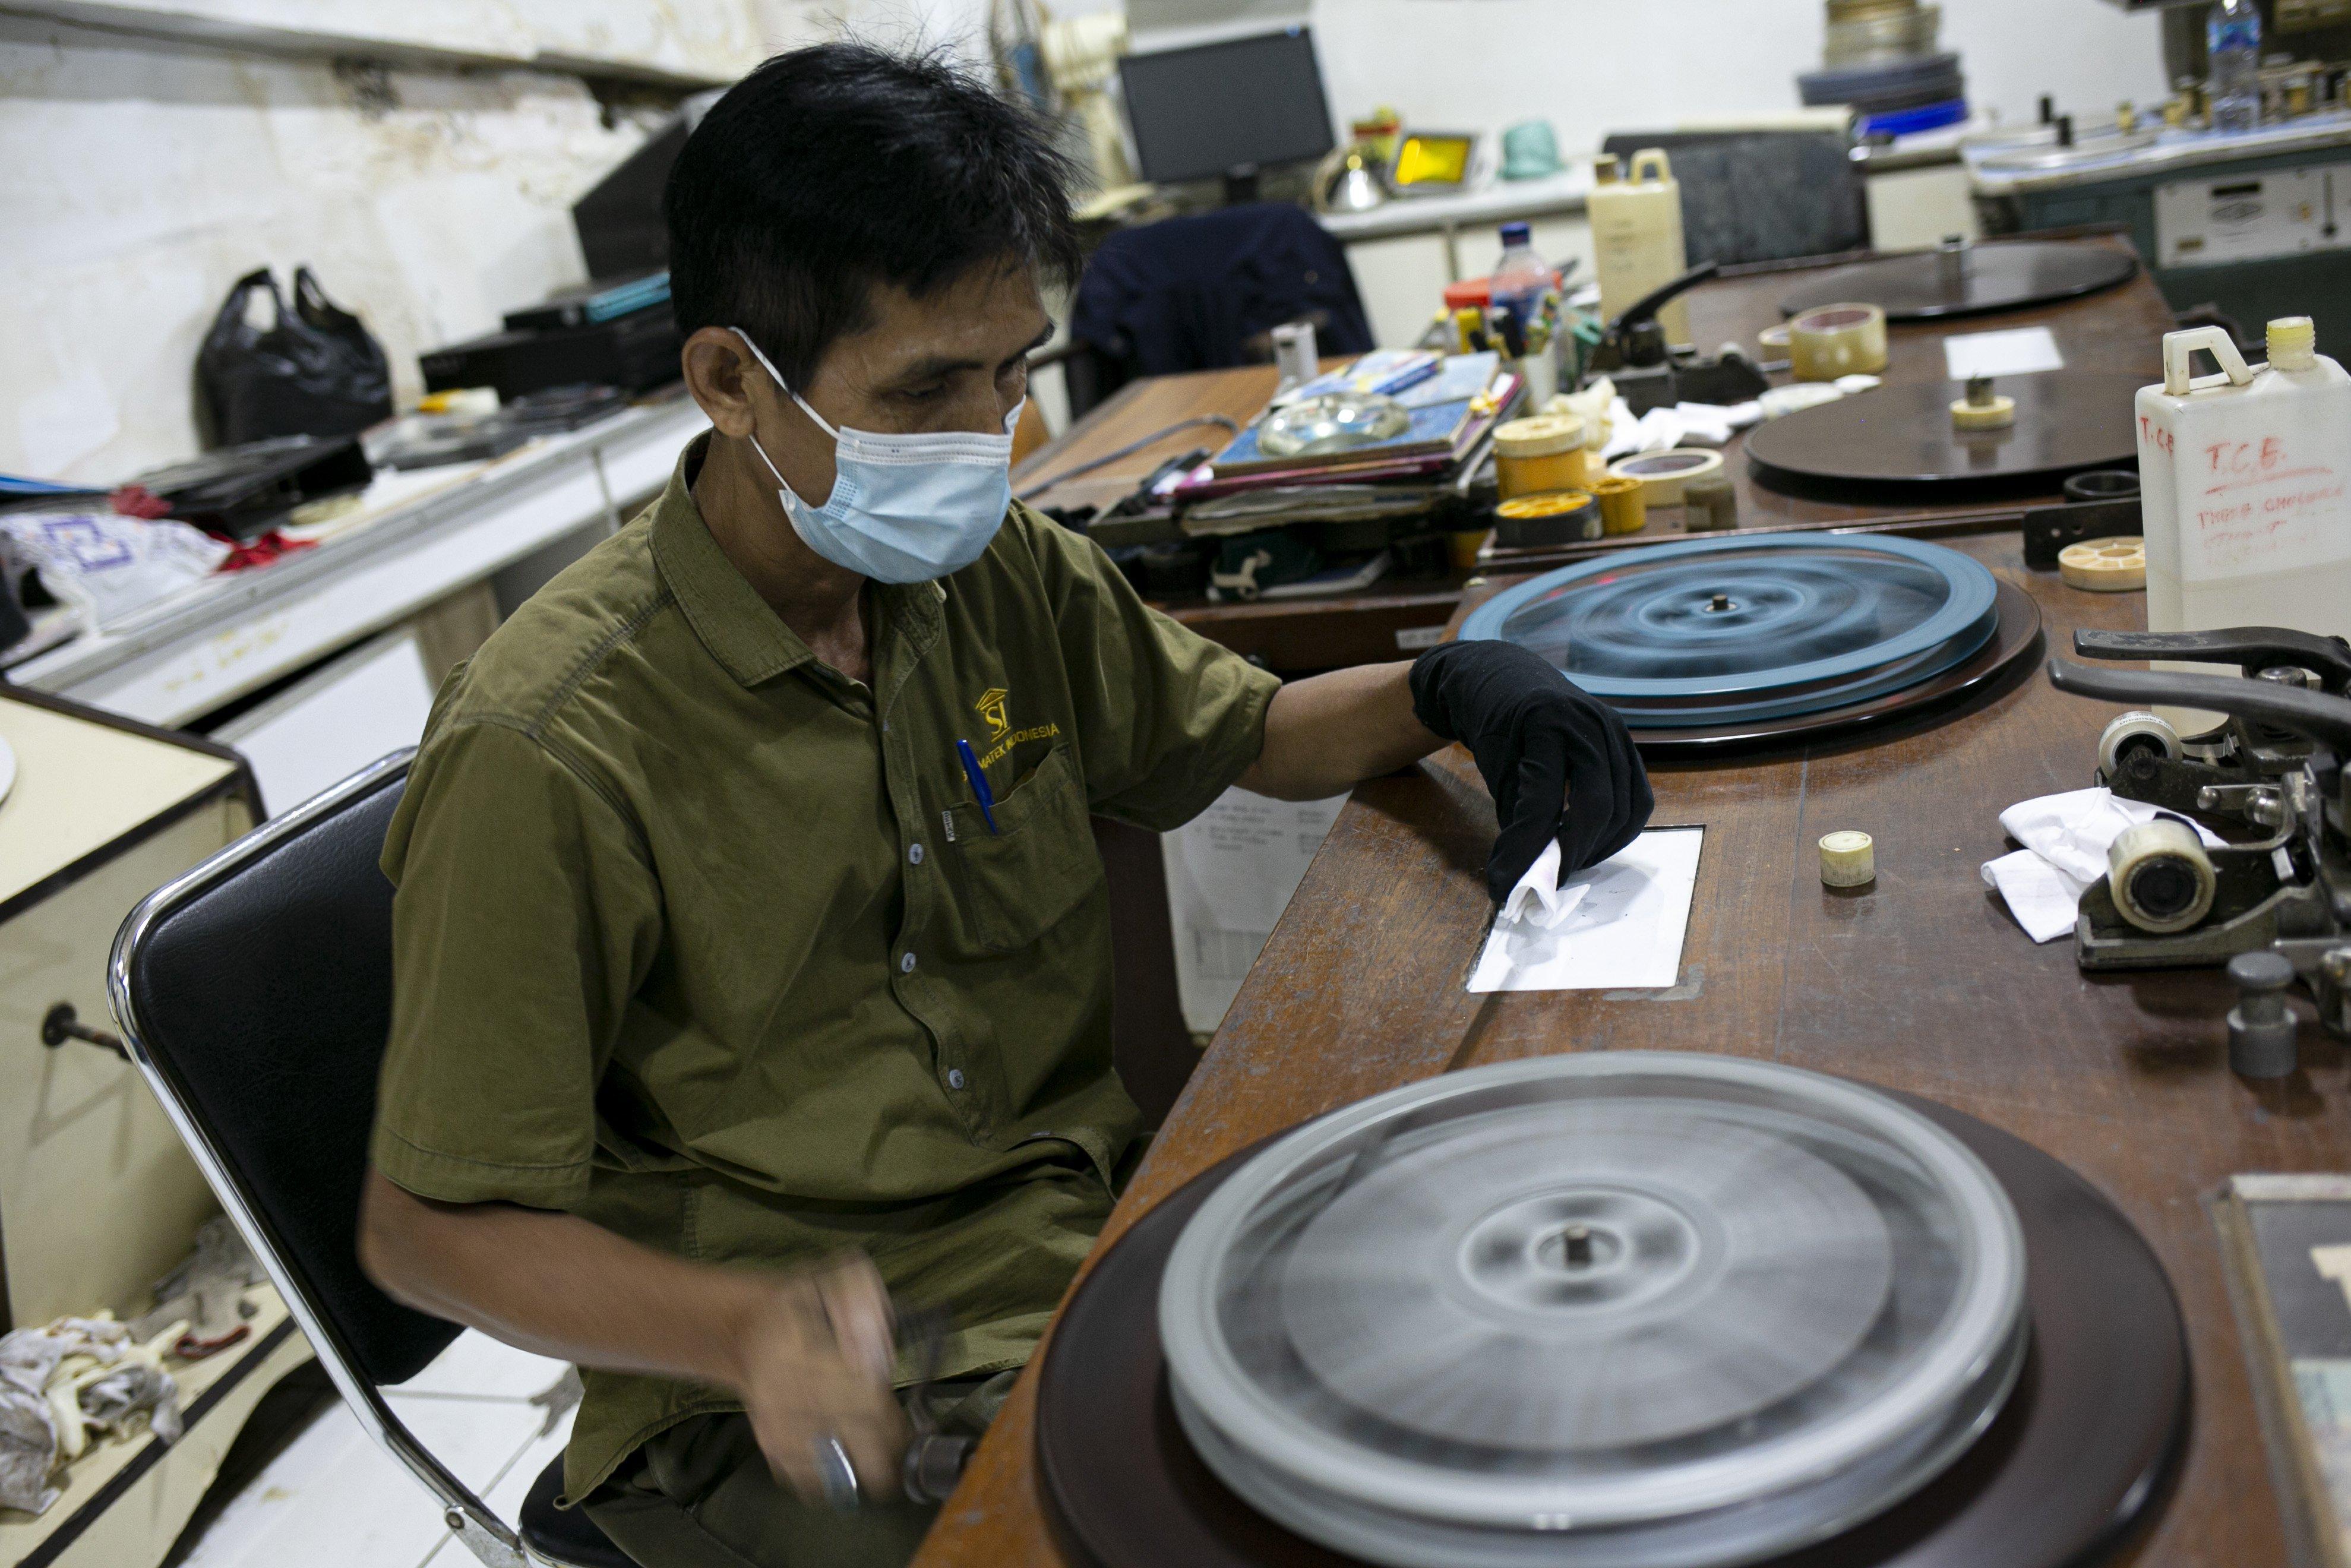 Firdaus (50), membersihkan gulungan seluloid di Gedung Sinematek, jalan HR. Rasuna Said, RT.2/RW.5, Karet Kuningan, Kecamatan Setiabudi, Kota Jakarta Selatan.